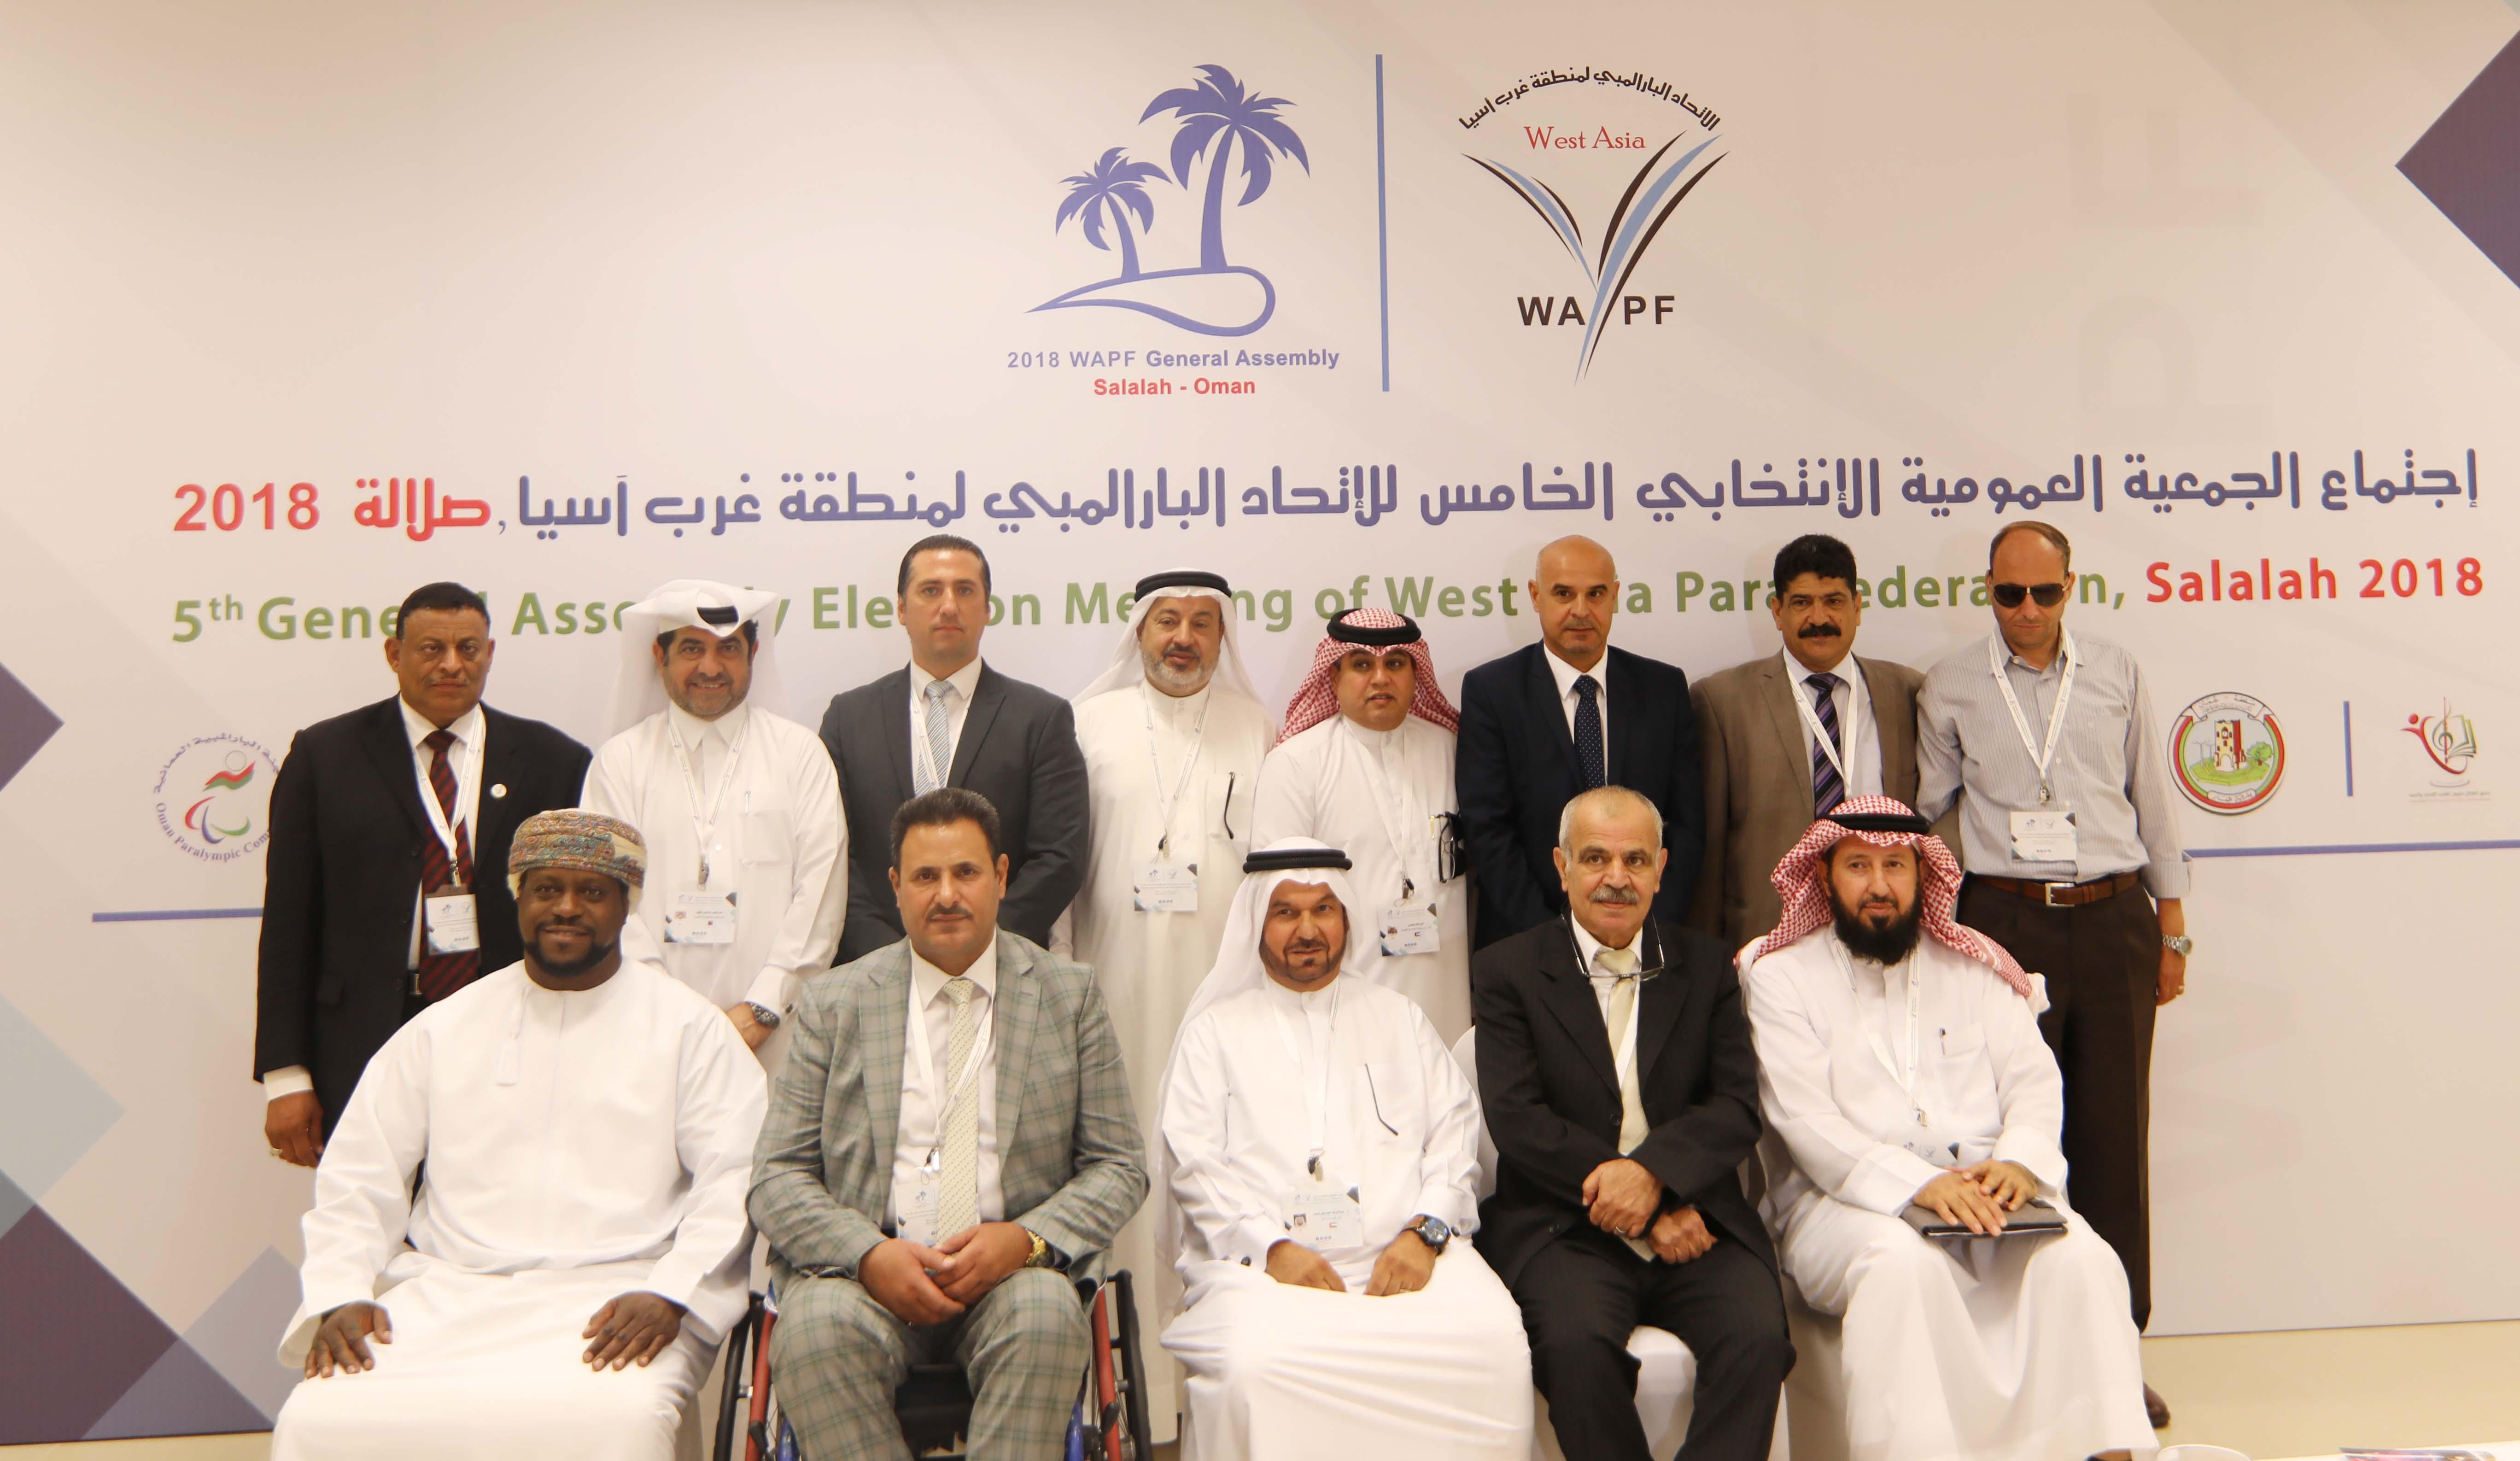 Photo of اعتماد تشكيل اللجان الرئيسية لاتحاد غرب آسيا للدورة 2019 – 2022